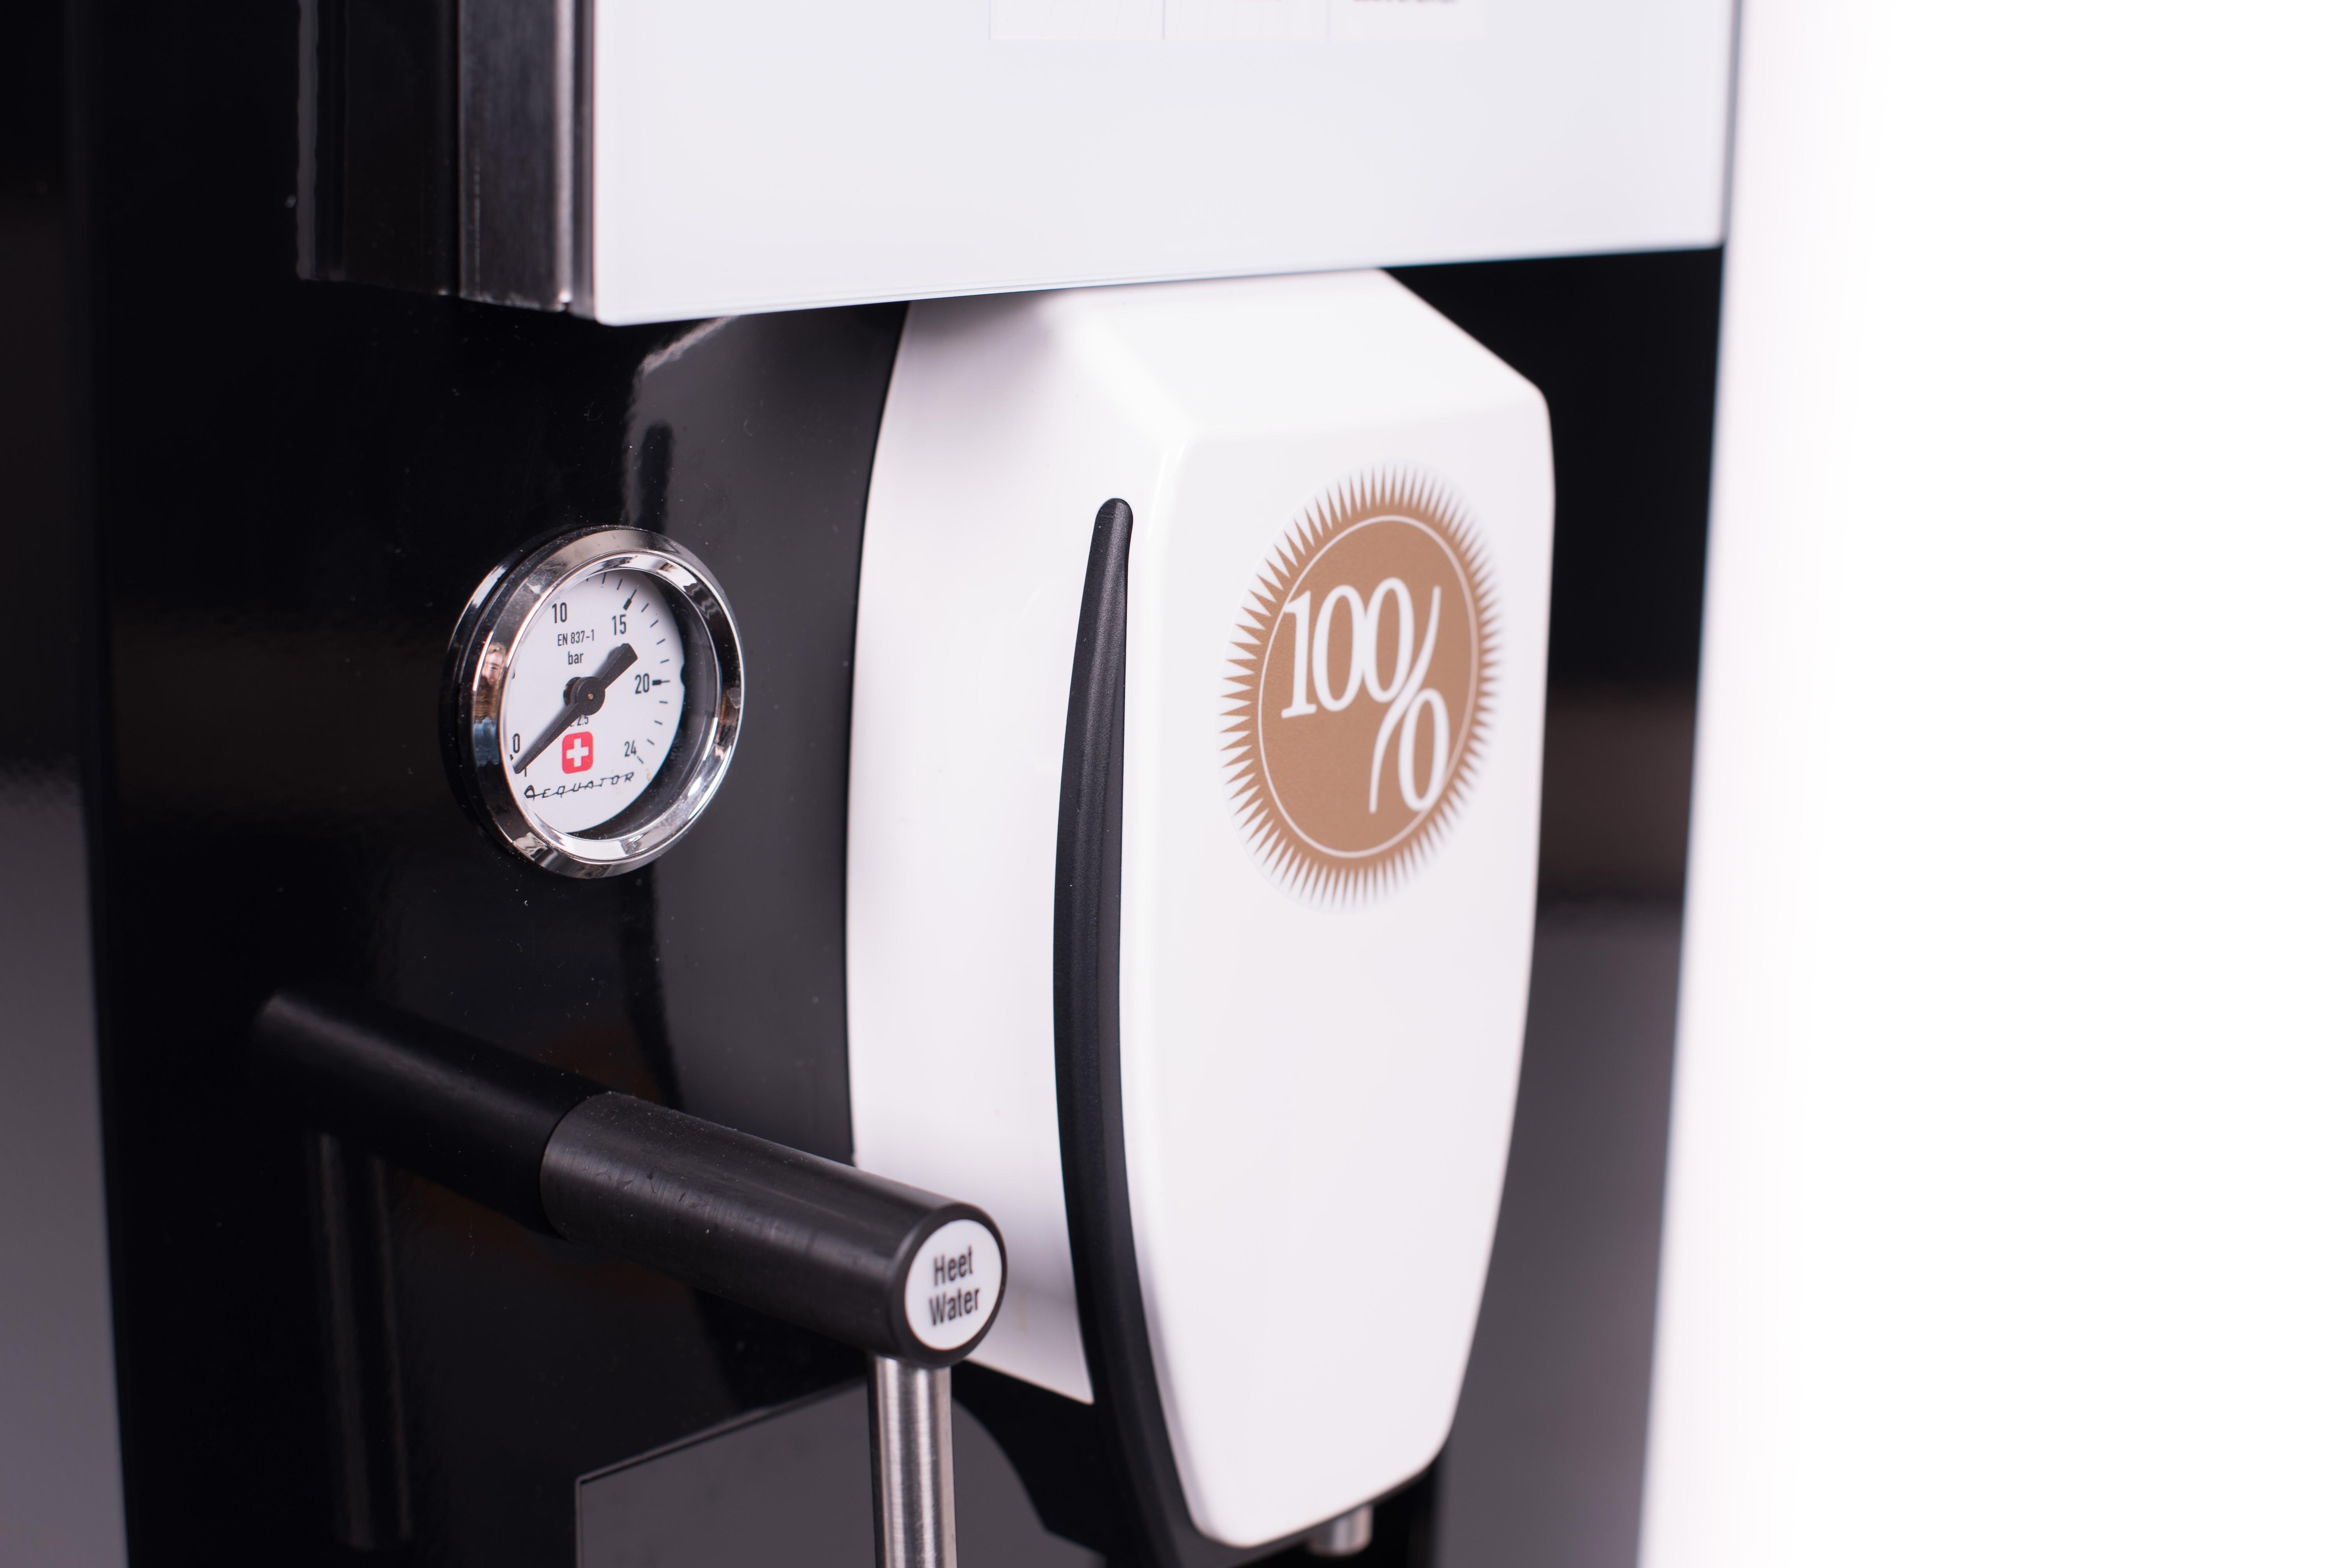 Cento% espressomachine | KoffiePartners